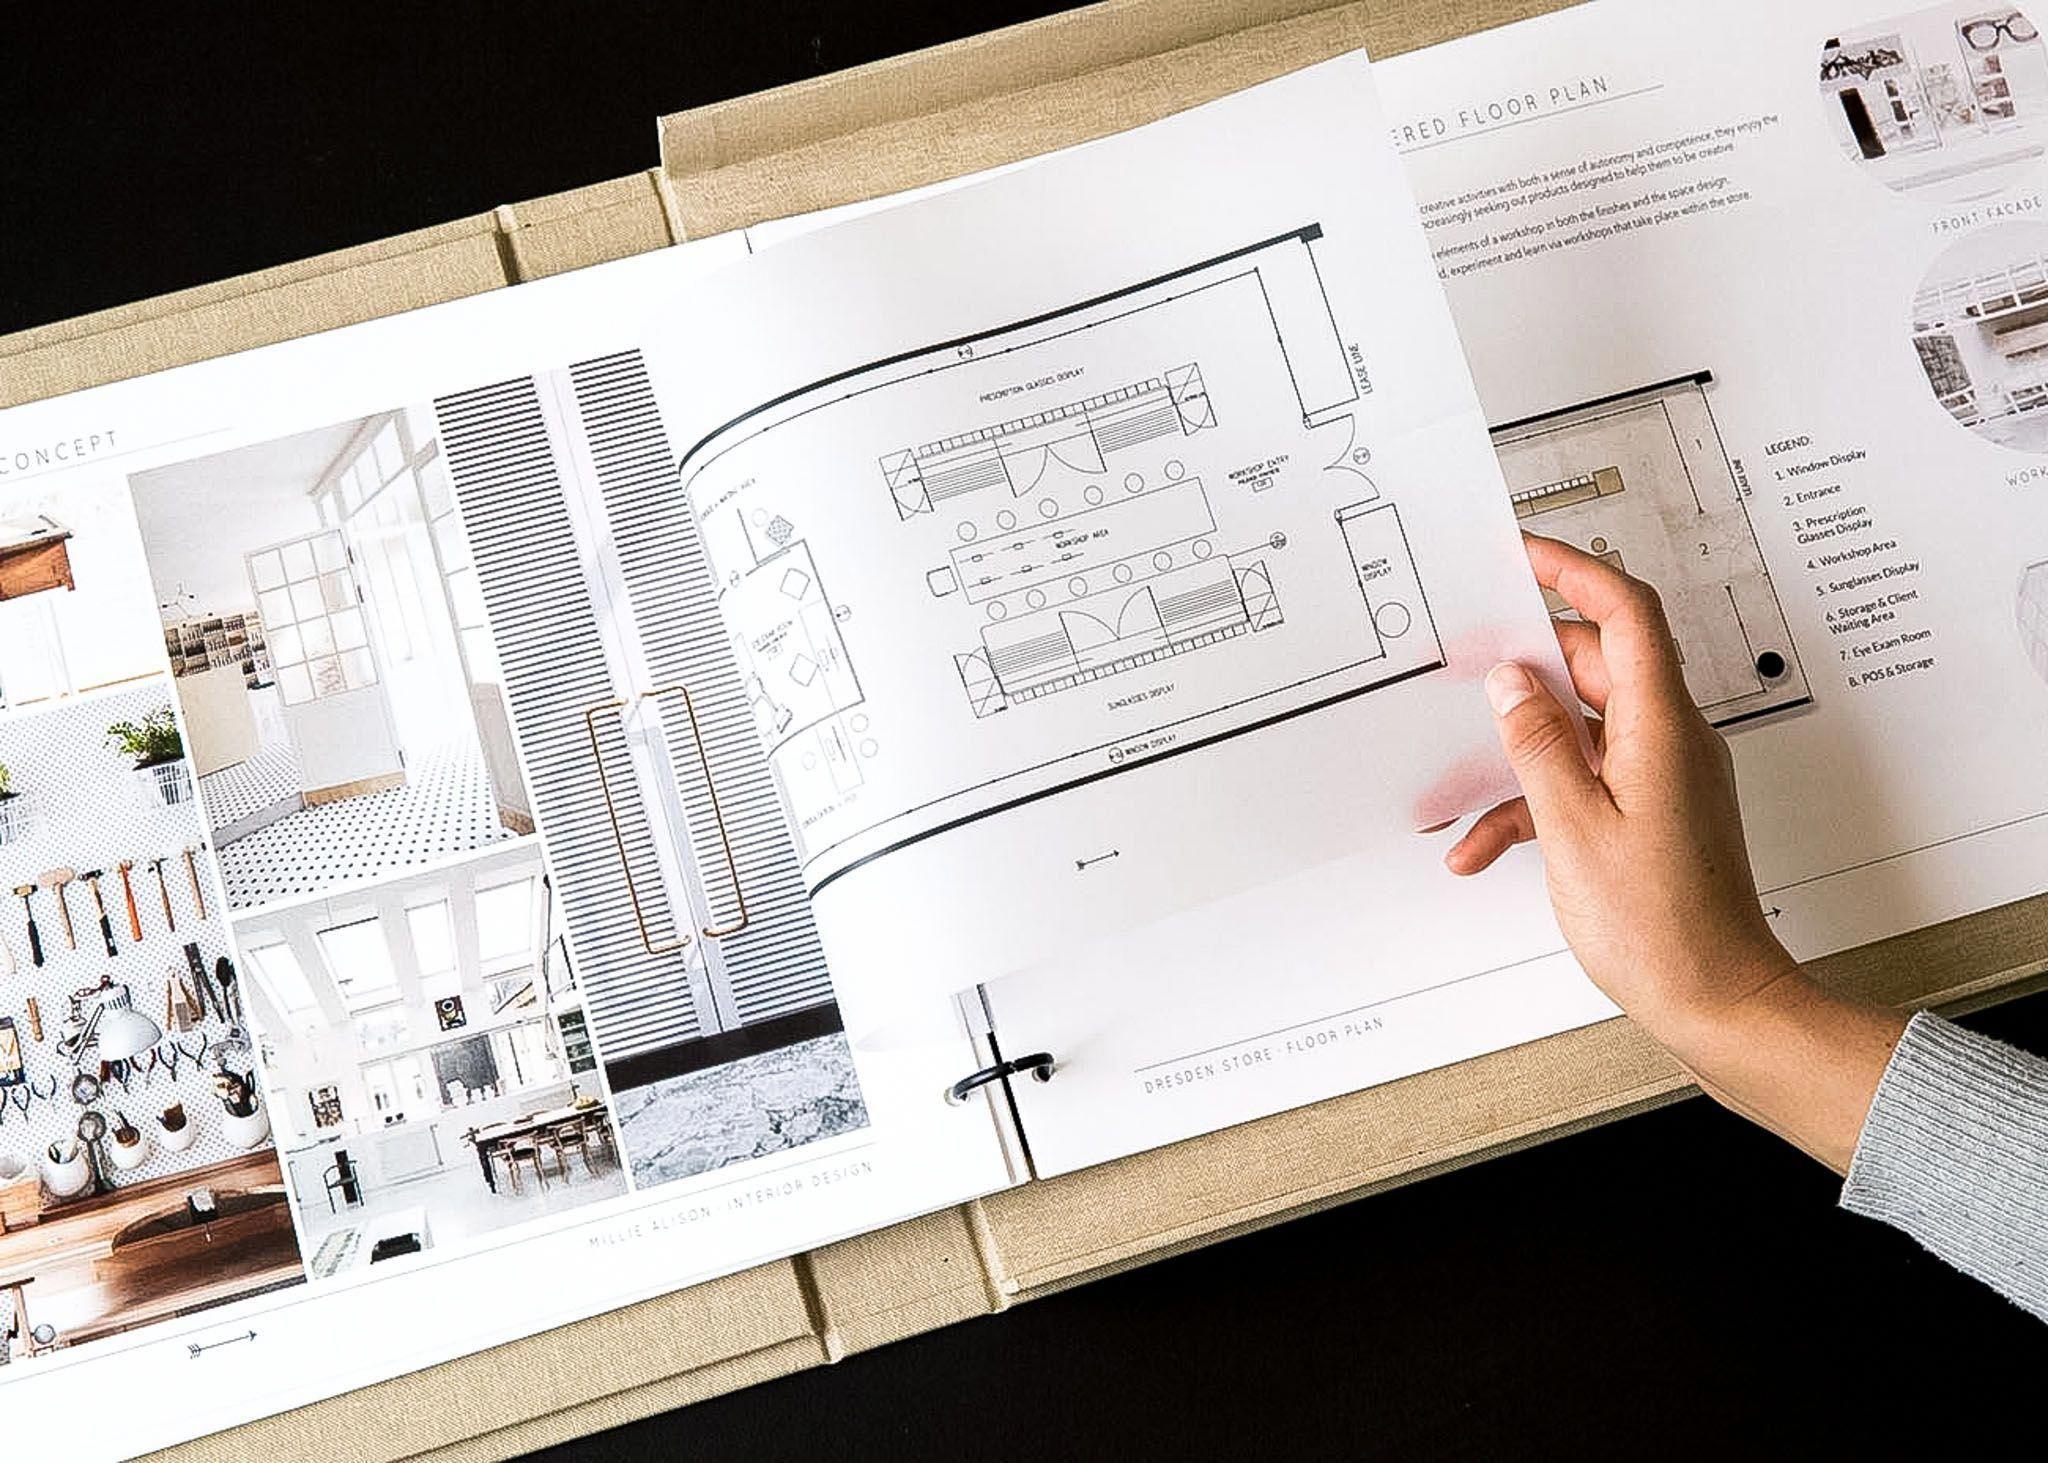 Student work interior design courses sydney school interiordesigncourses also rh pinterest